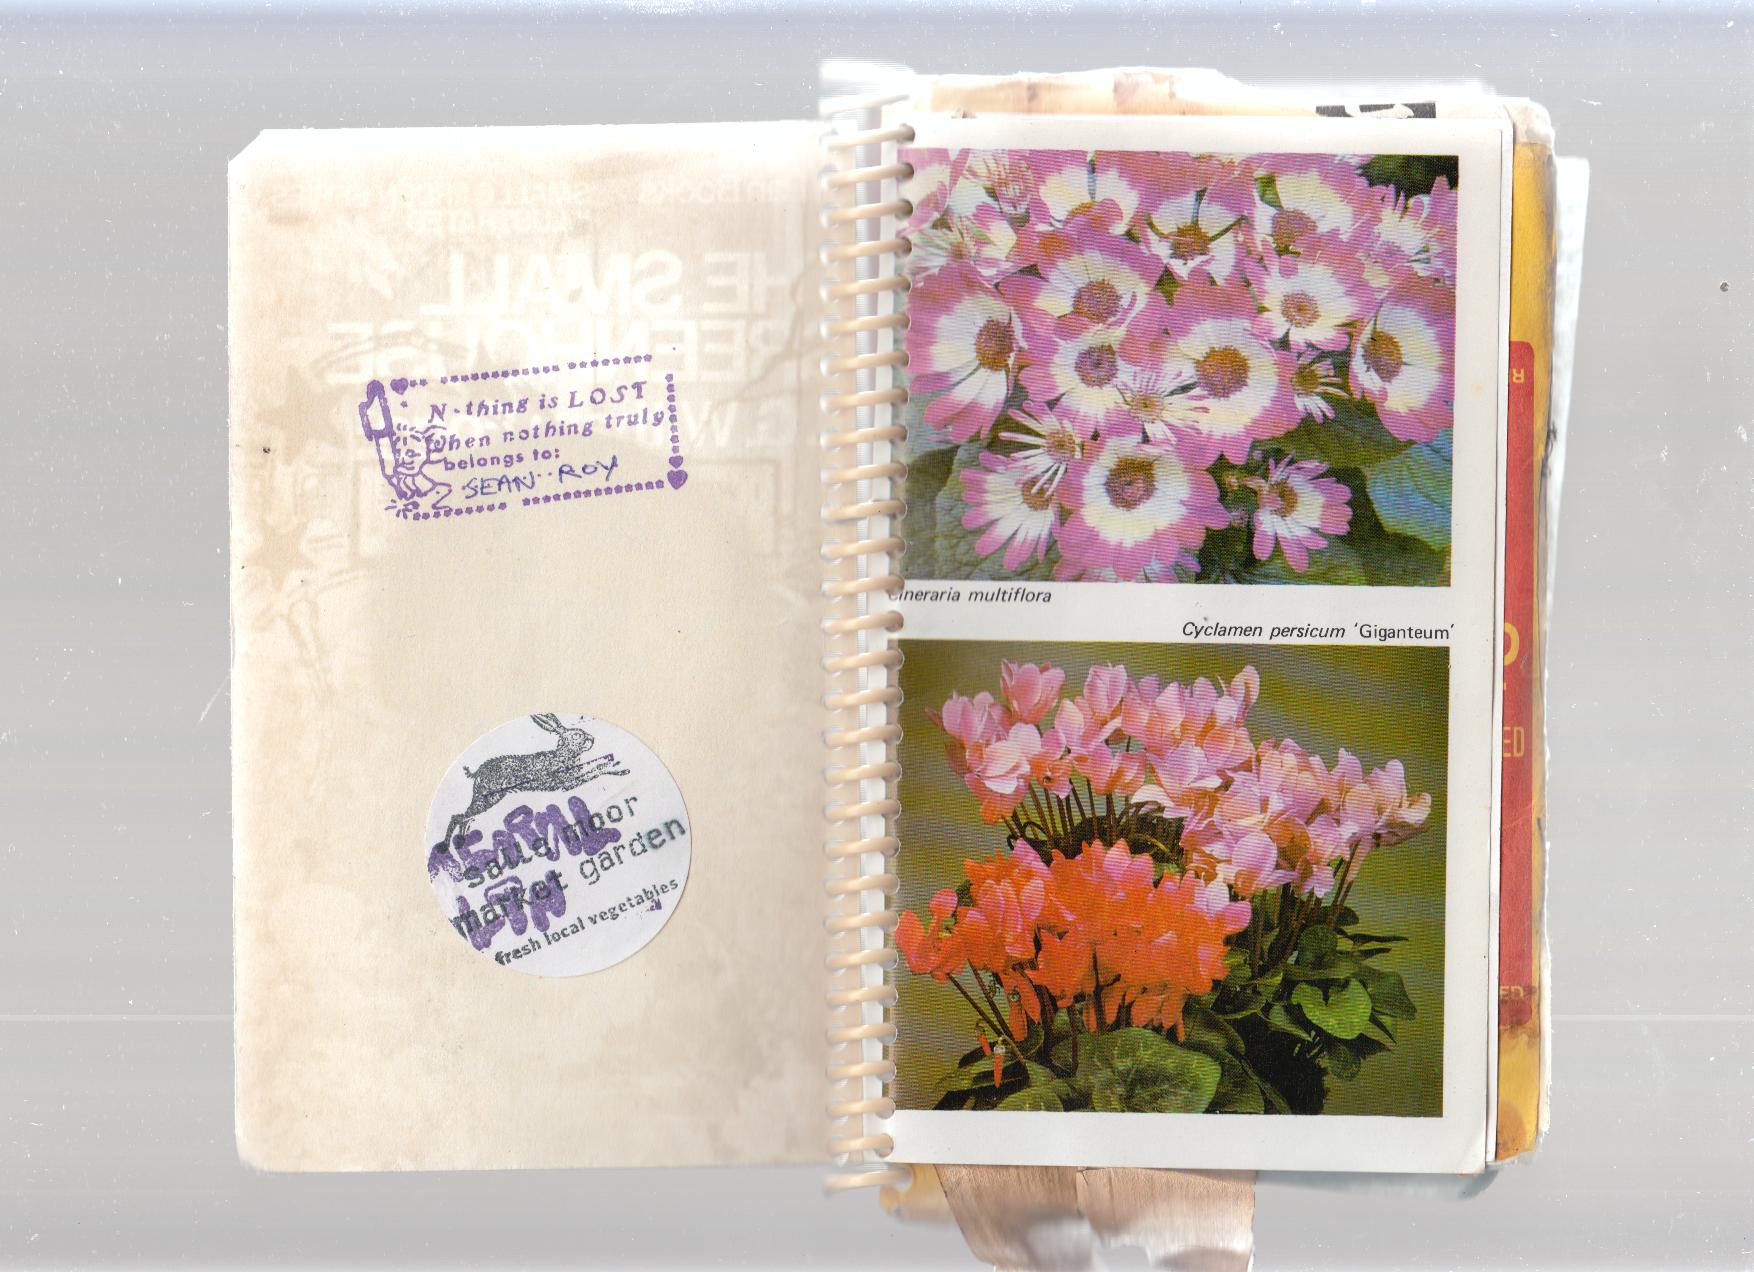 Reciprocity Residency scrapbook. Image via Fermental Health